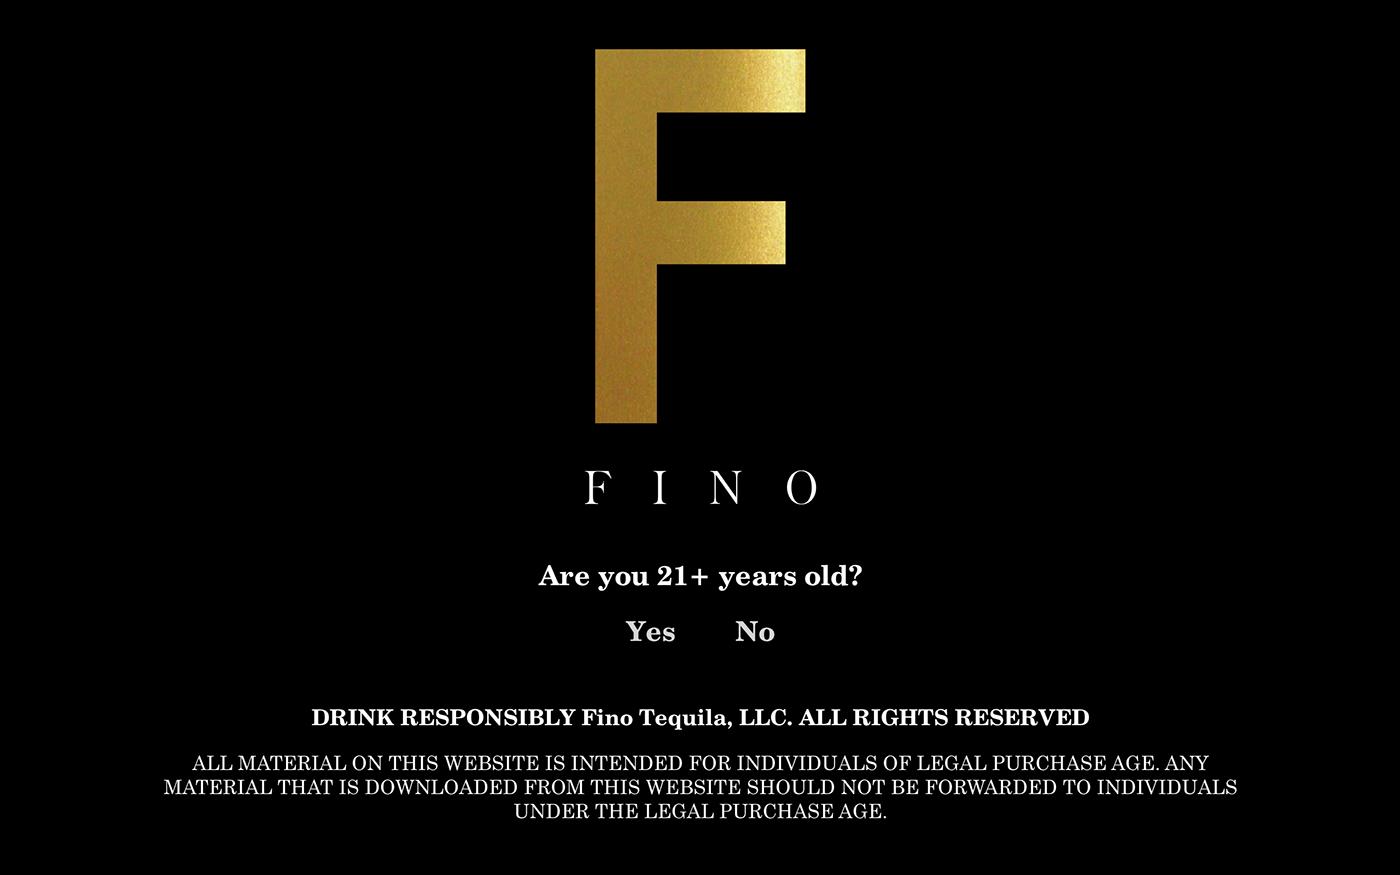 Fino Tequila (Web Design and Logo Vectorizing) on Behance